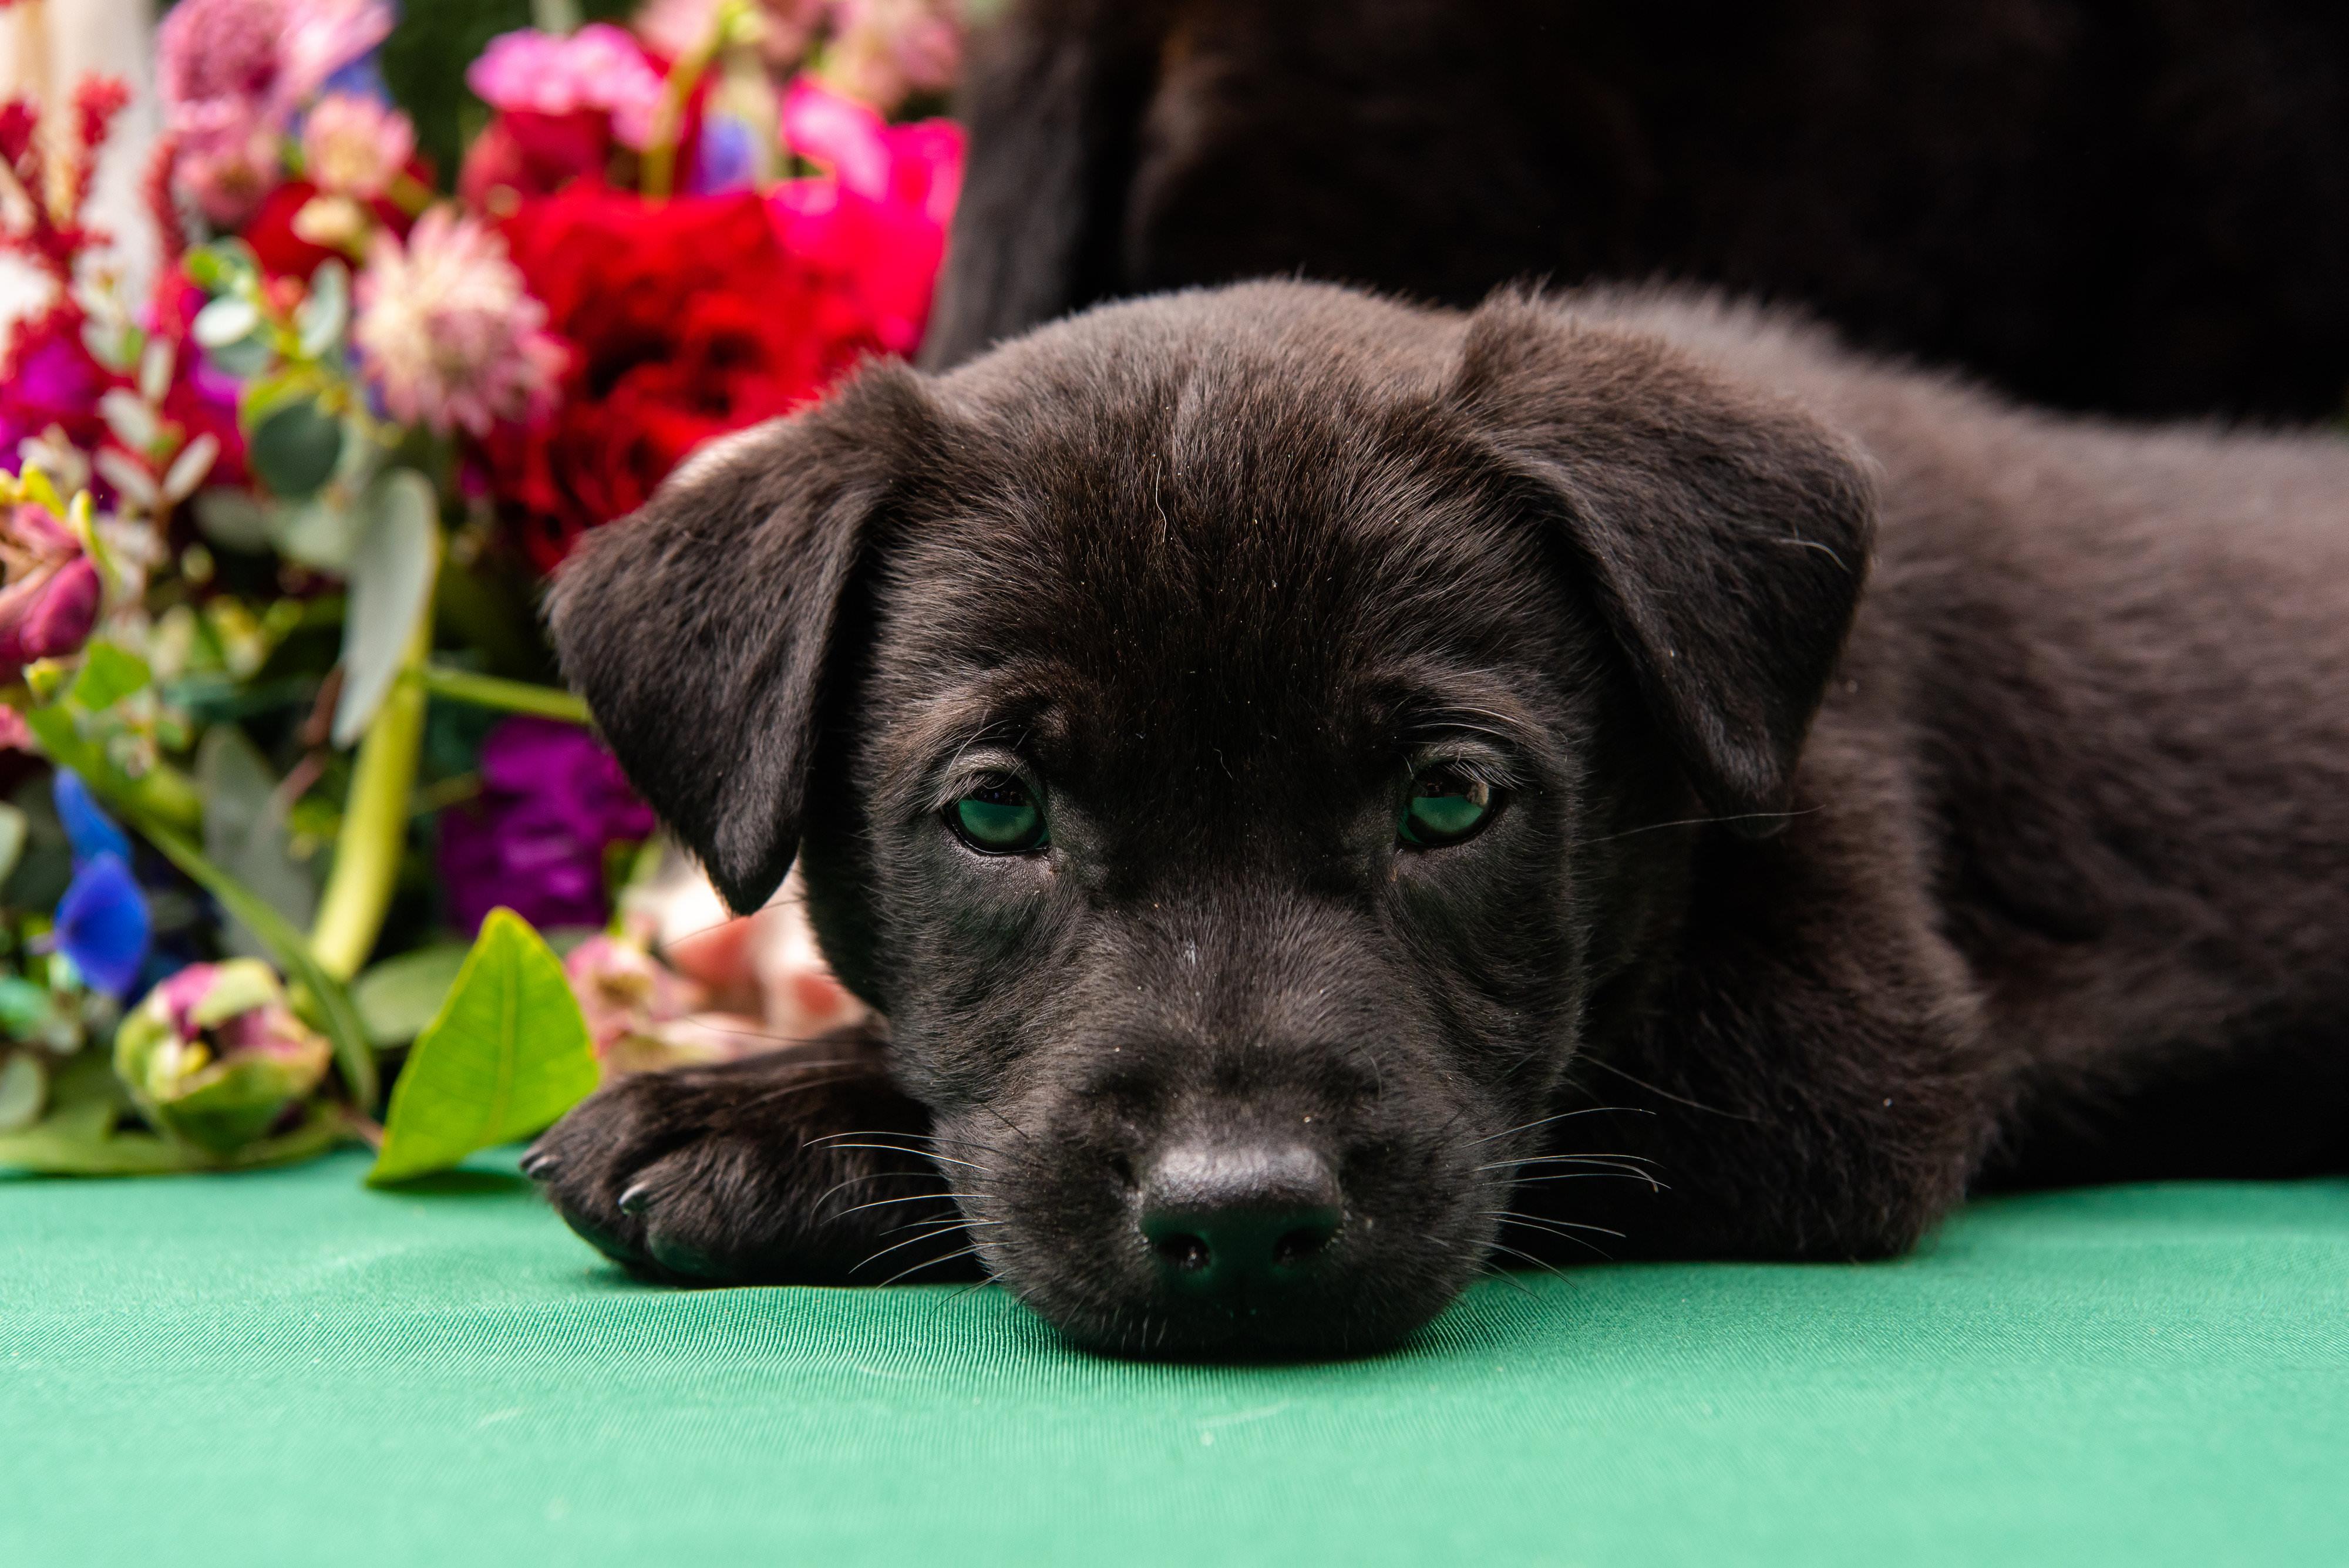 Black Puppy Closeup Portrait | Tampa Bay Wedding Photographer Caroline and Evan Photography | Pet Coordinators FairyTale Pet Care